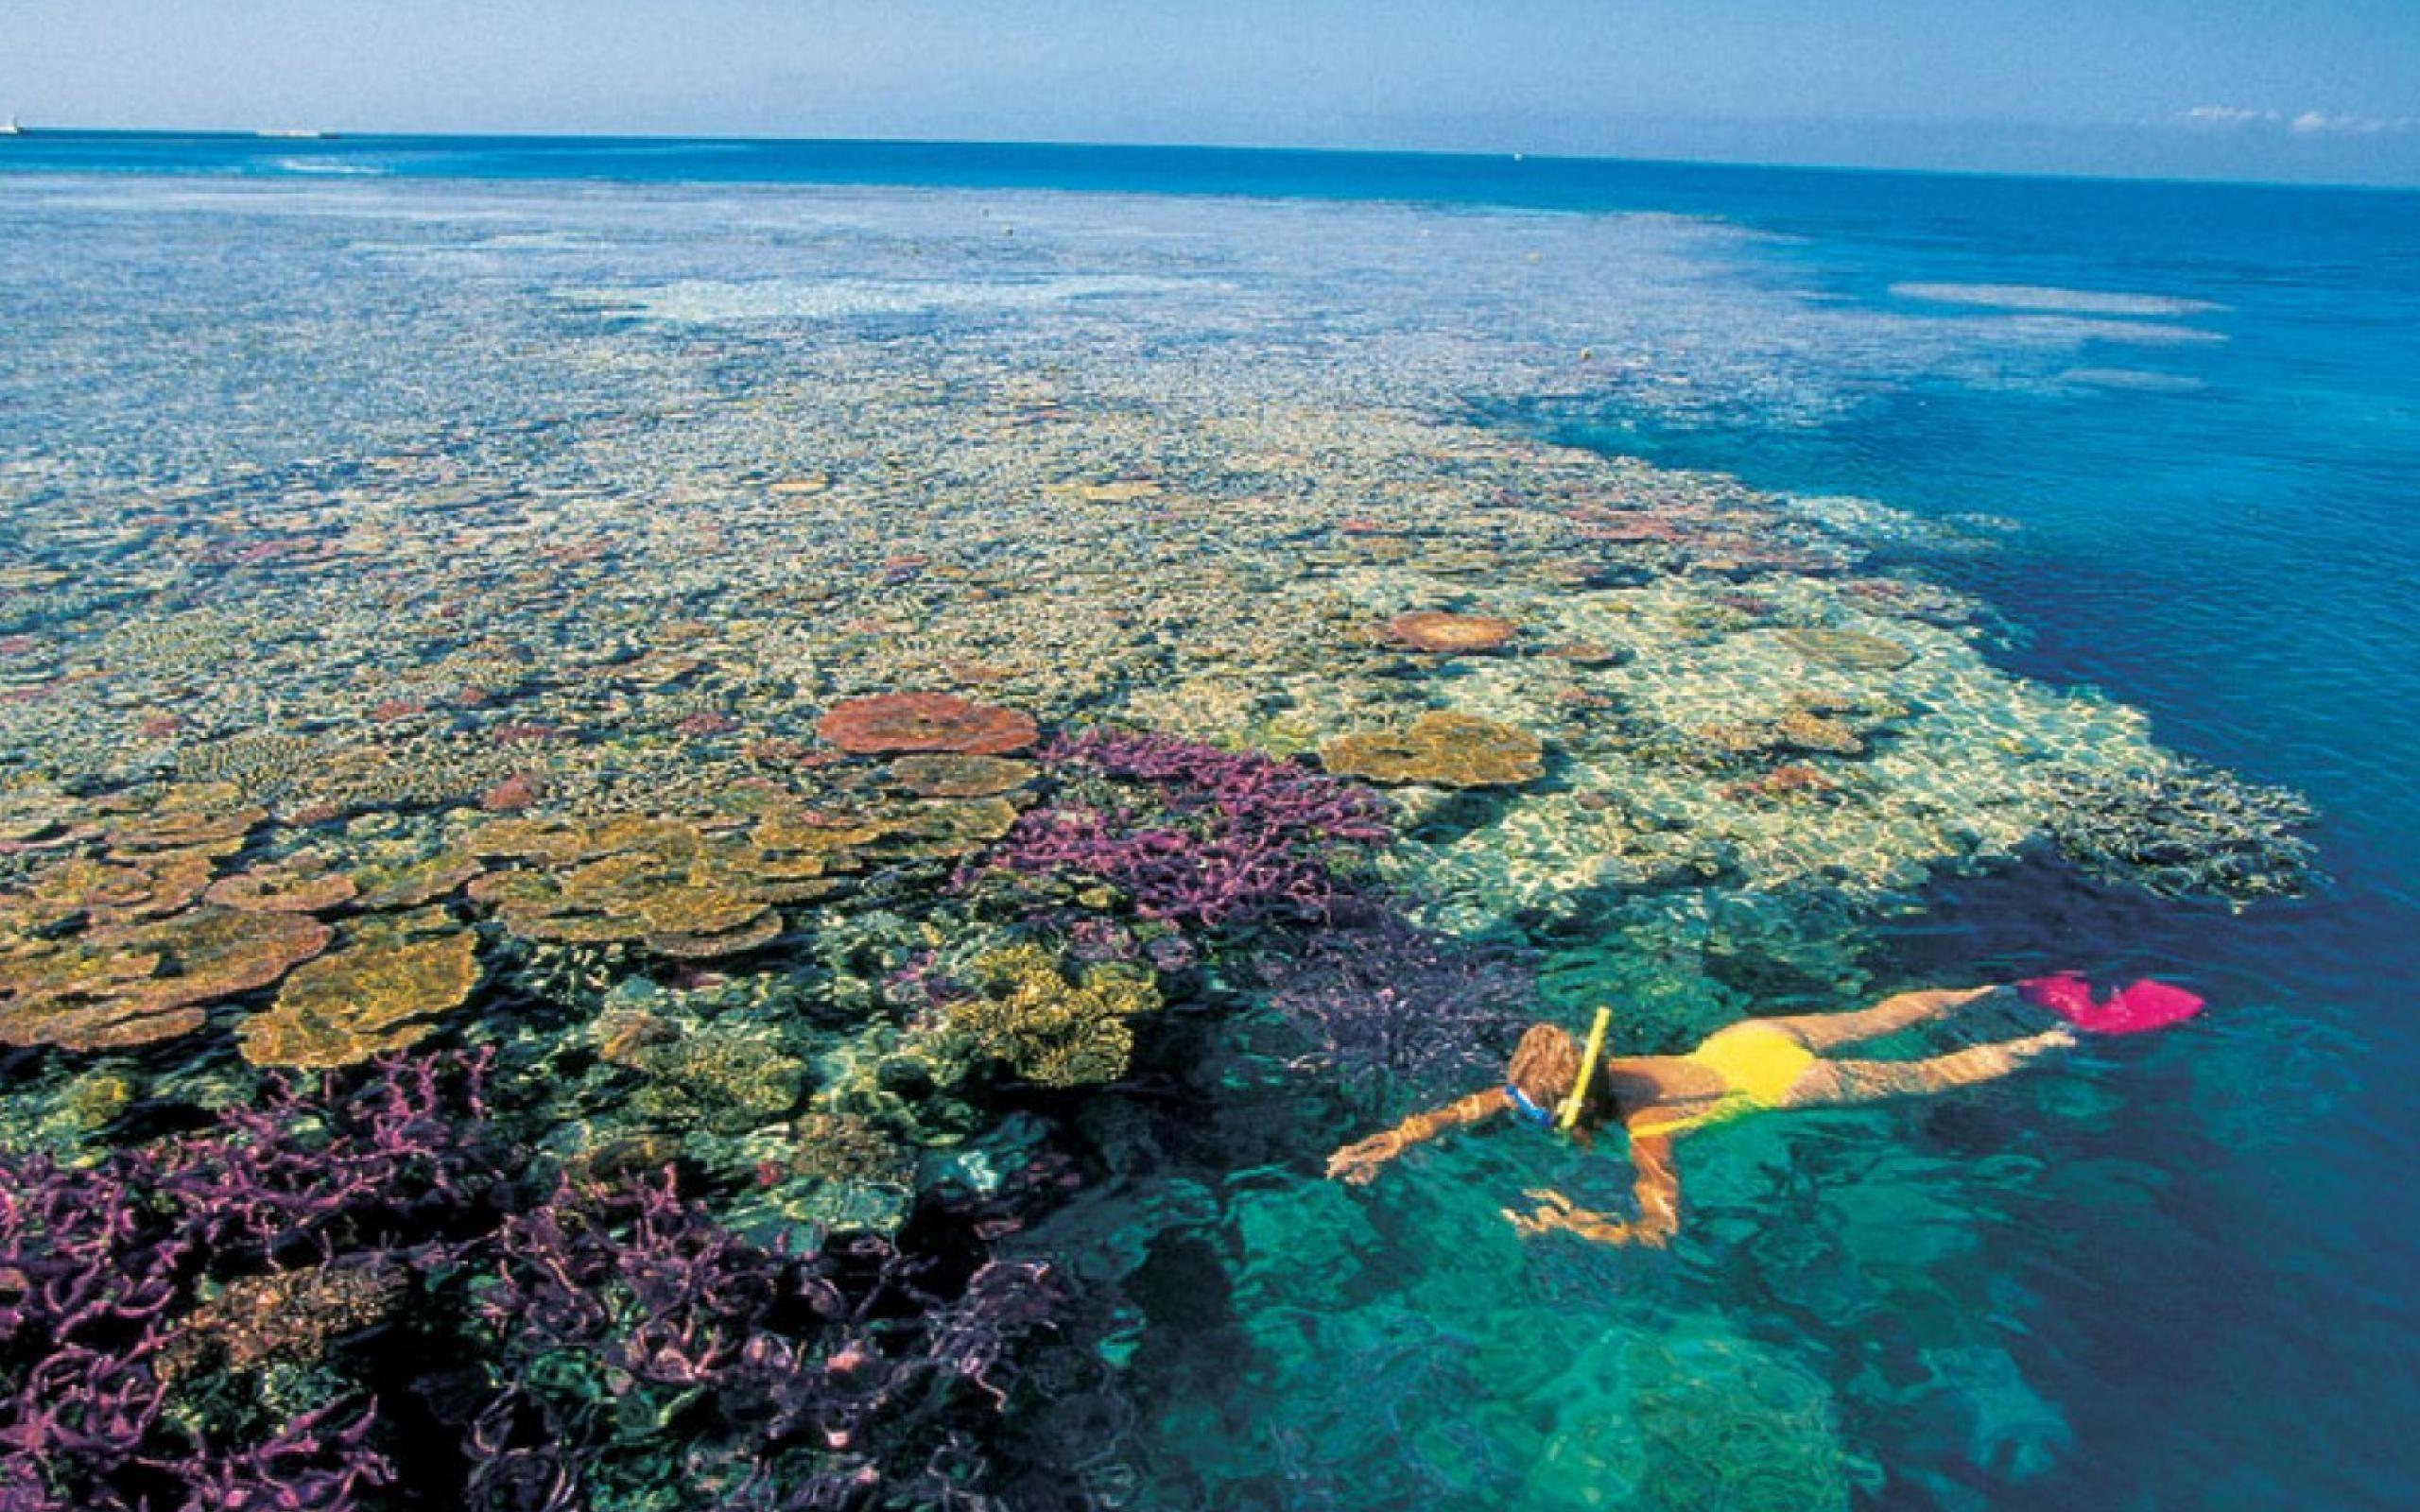 Great barrier reef marine park wallpapers wallpaper cave - Great barrier reef desktop background ...